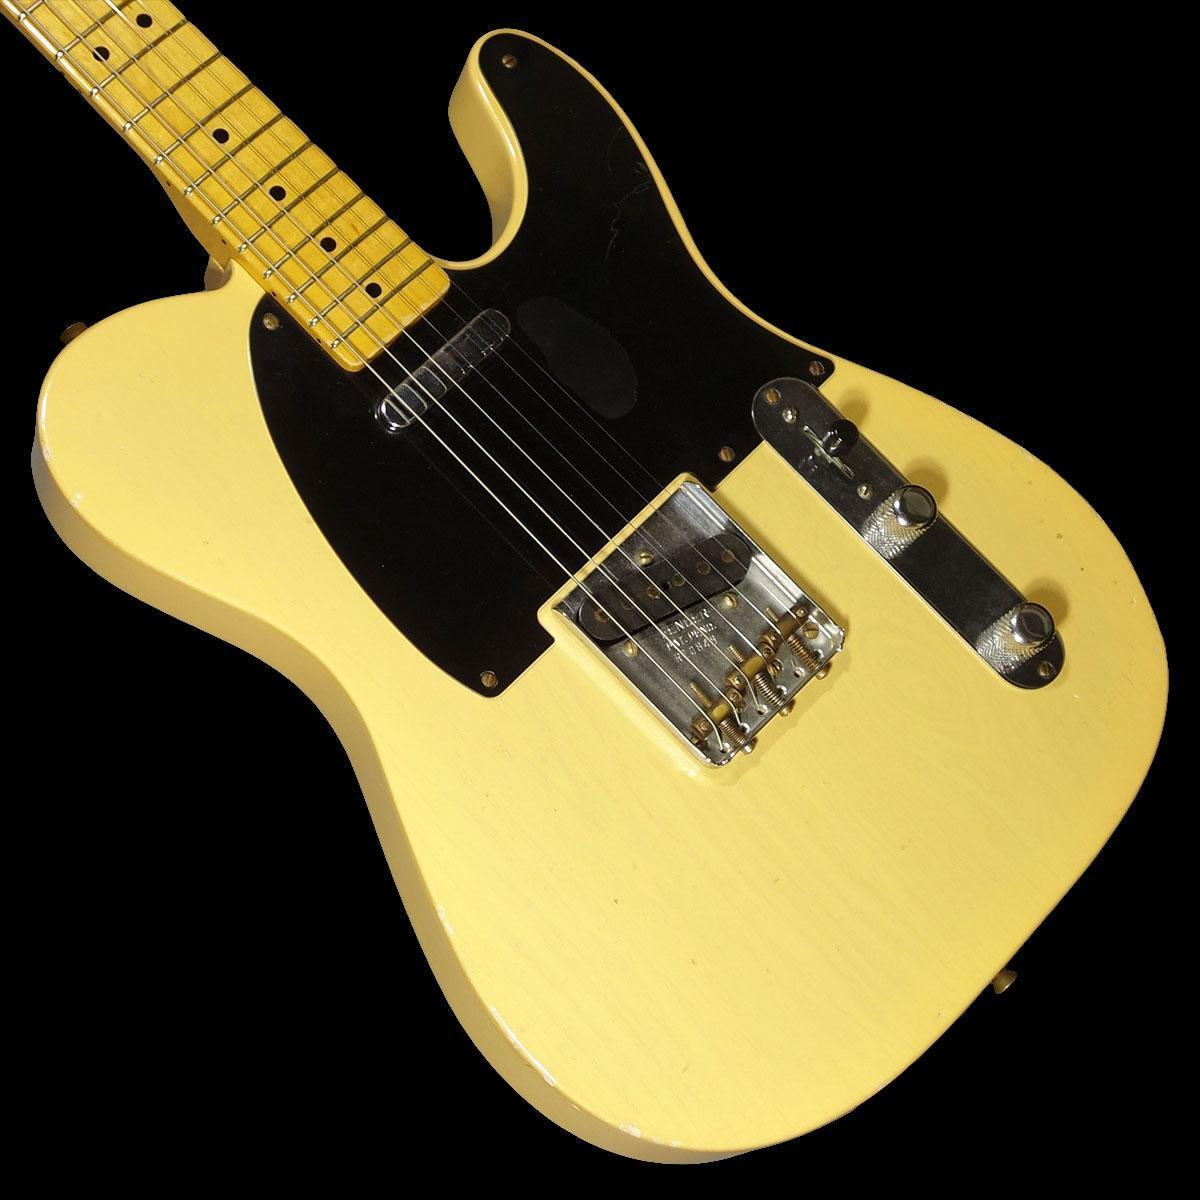 Fender Custom Shop 1951 Nocaster Relic '2013 [Nagoya Sakae]